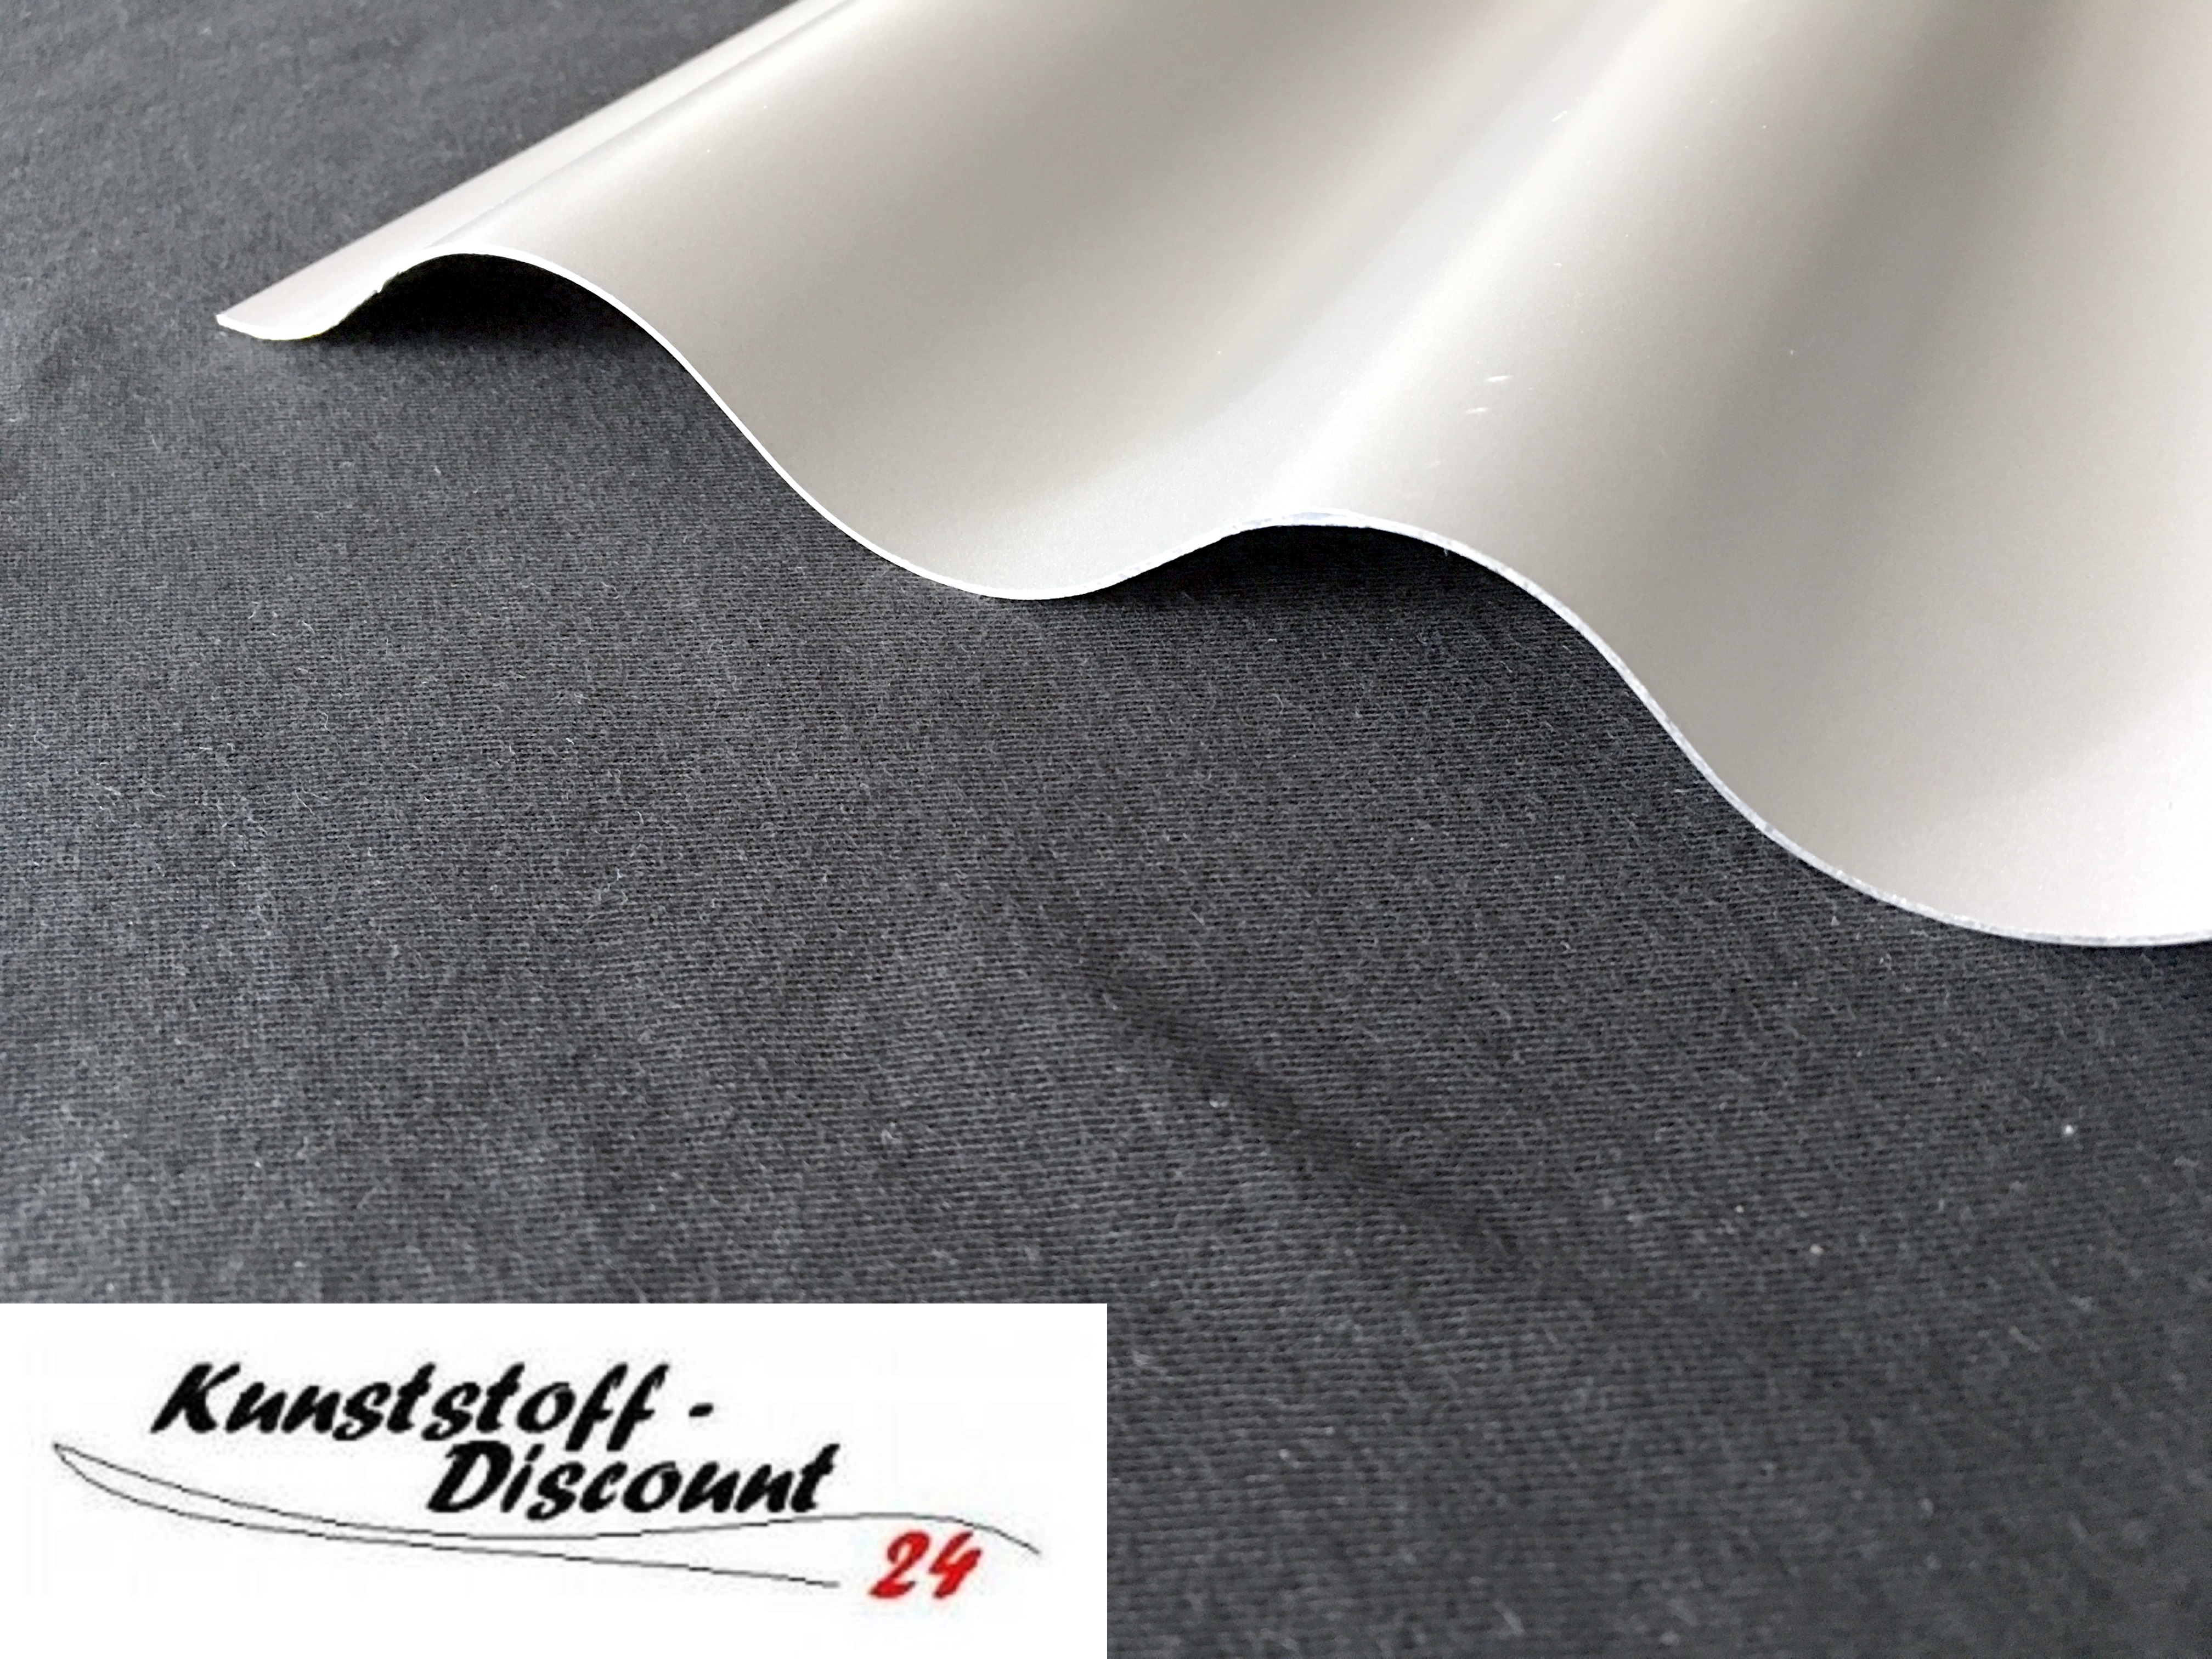 kunststoff wellblech wellblech plastik messing kunststoff schneiden aus kaufen wellblech. Black Bedroom Furniture Sets. Home Design Ideas